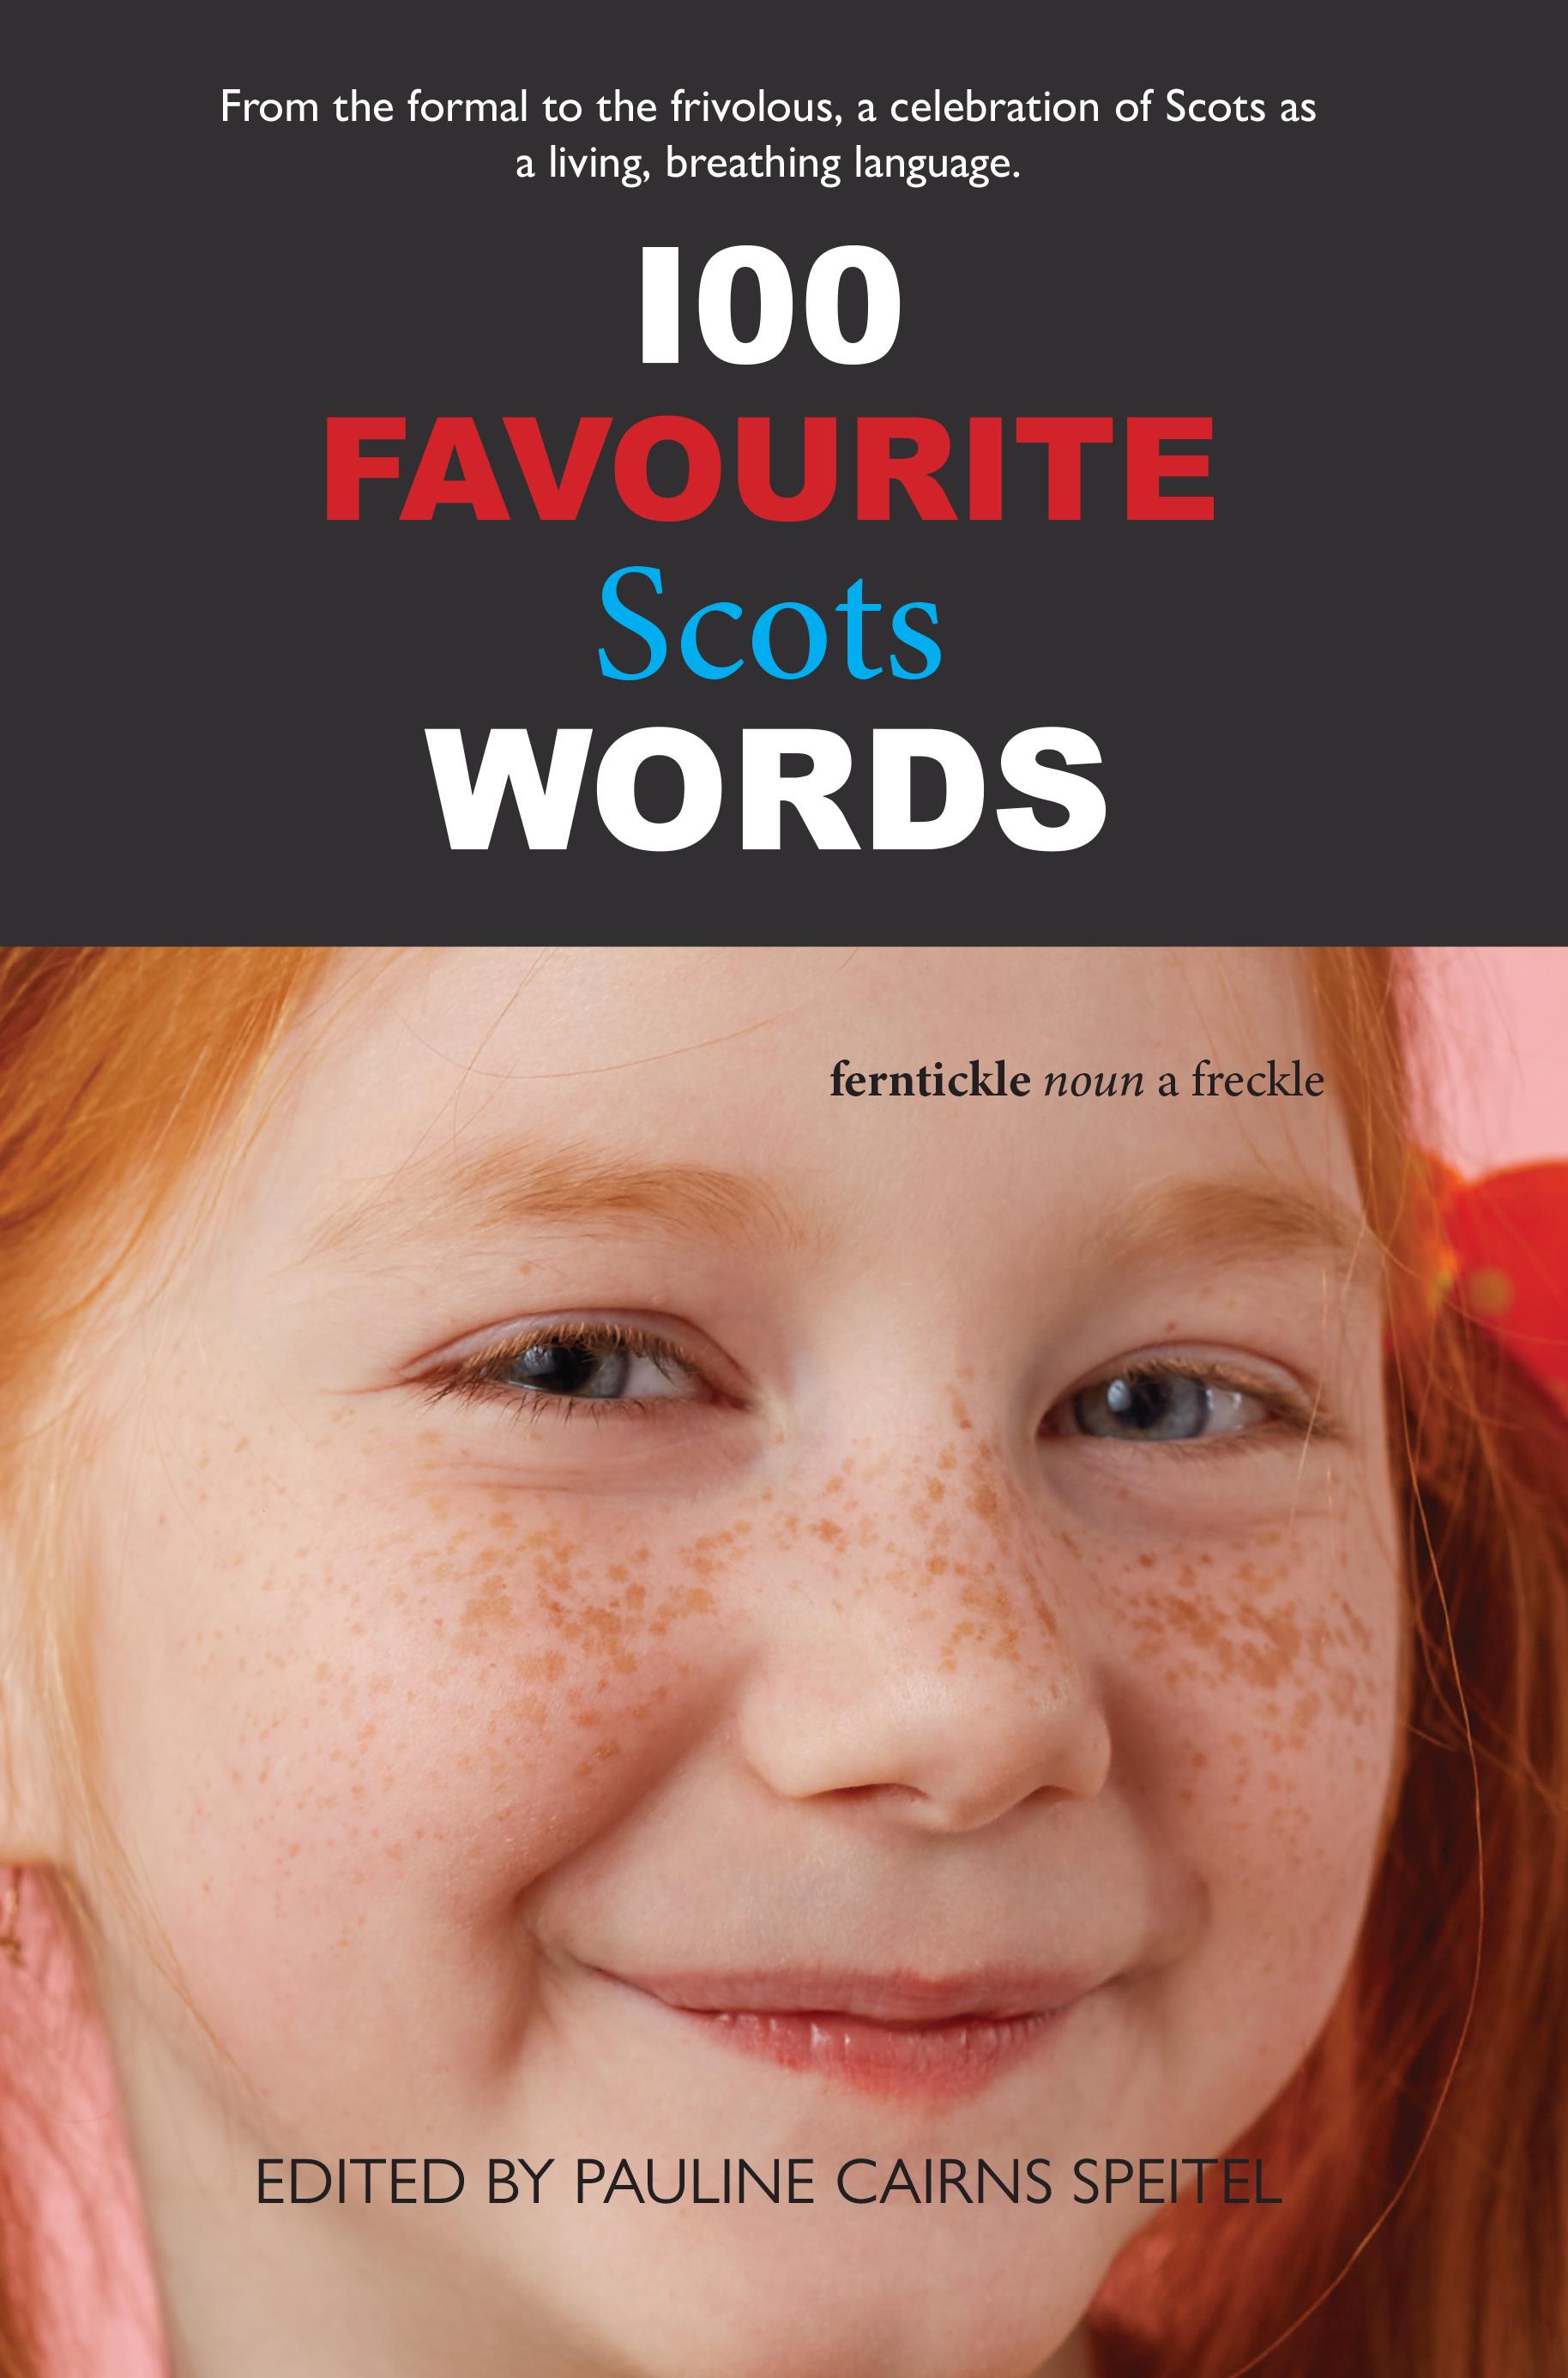 100 Favourite Scots Words Pauline Cairns Speitel 9781912147991 Luath Press.jpg